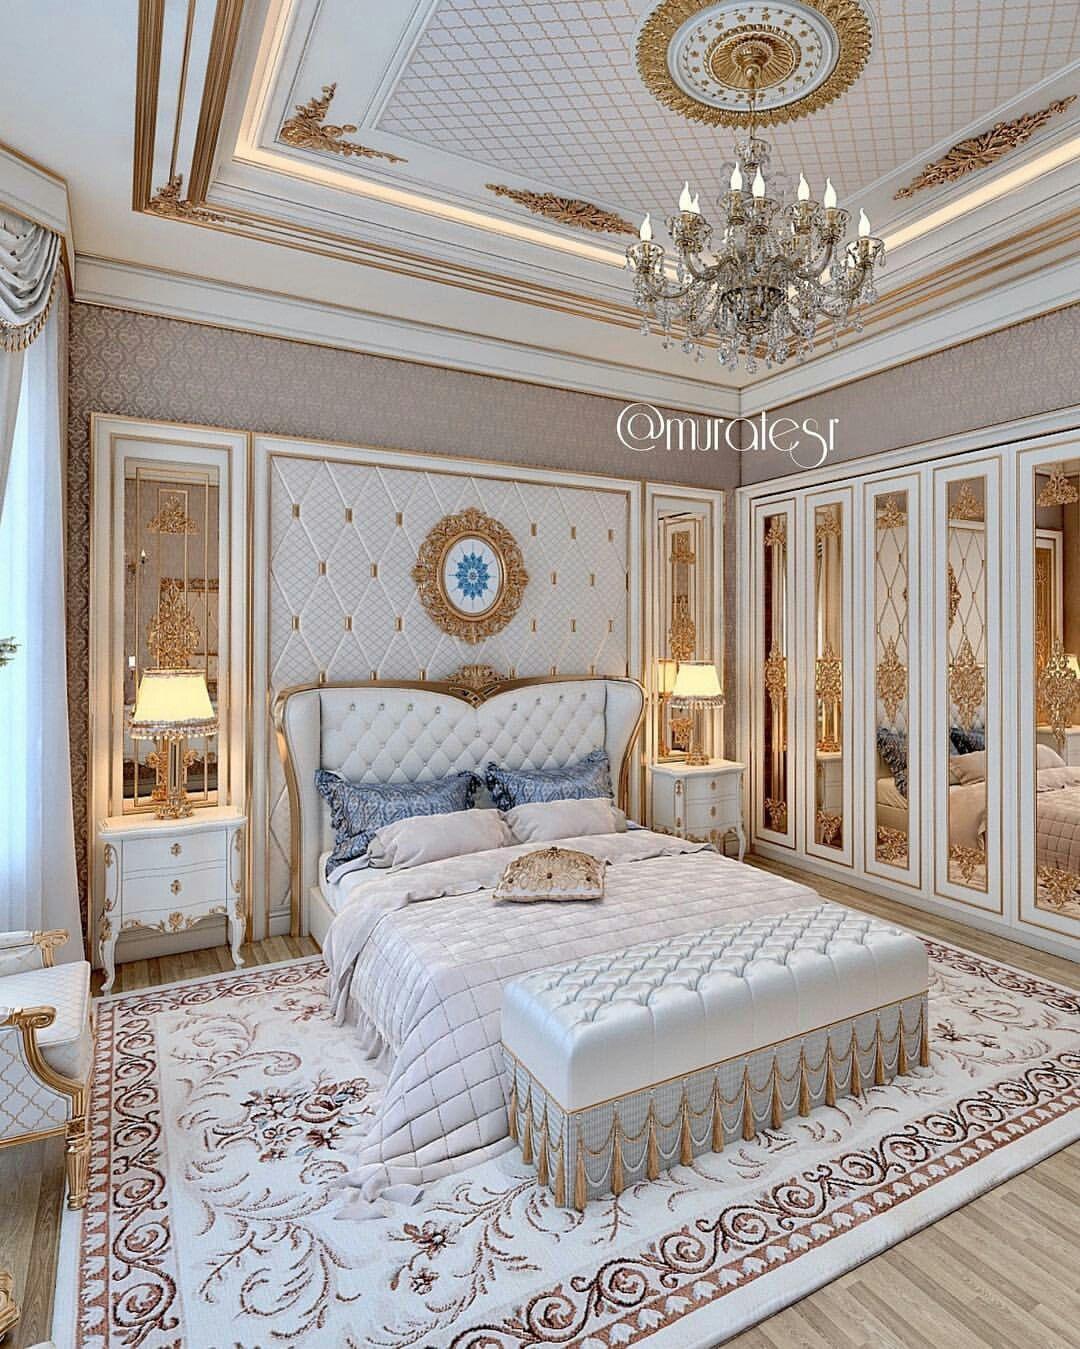 Luxury Bed Room: Pin By زوبعة في فنجان On غرف نوم